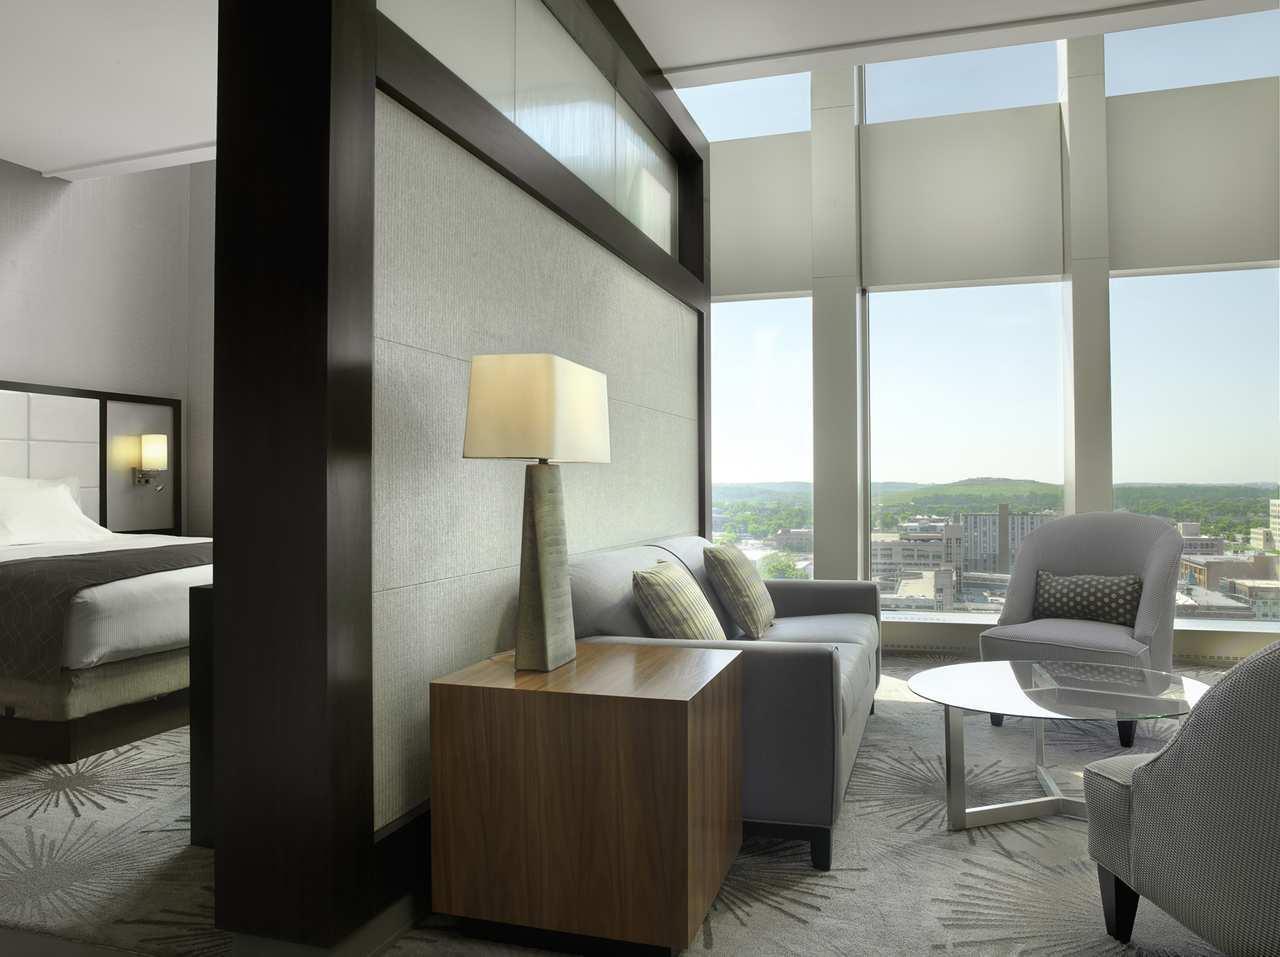 DoubleTree by Hilton Hotel Cedar Rapids Convention Complex image 15